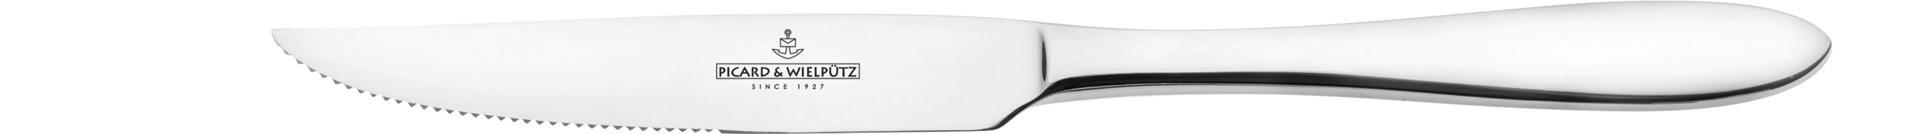 Bozen, Steakmesser Monoblock 239 mm poliert